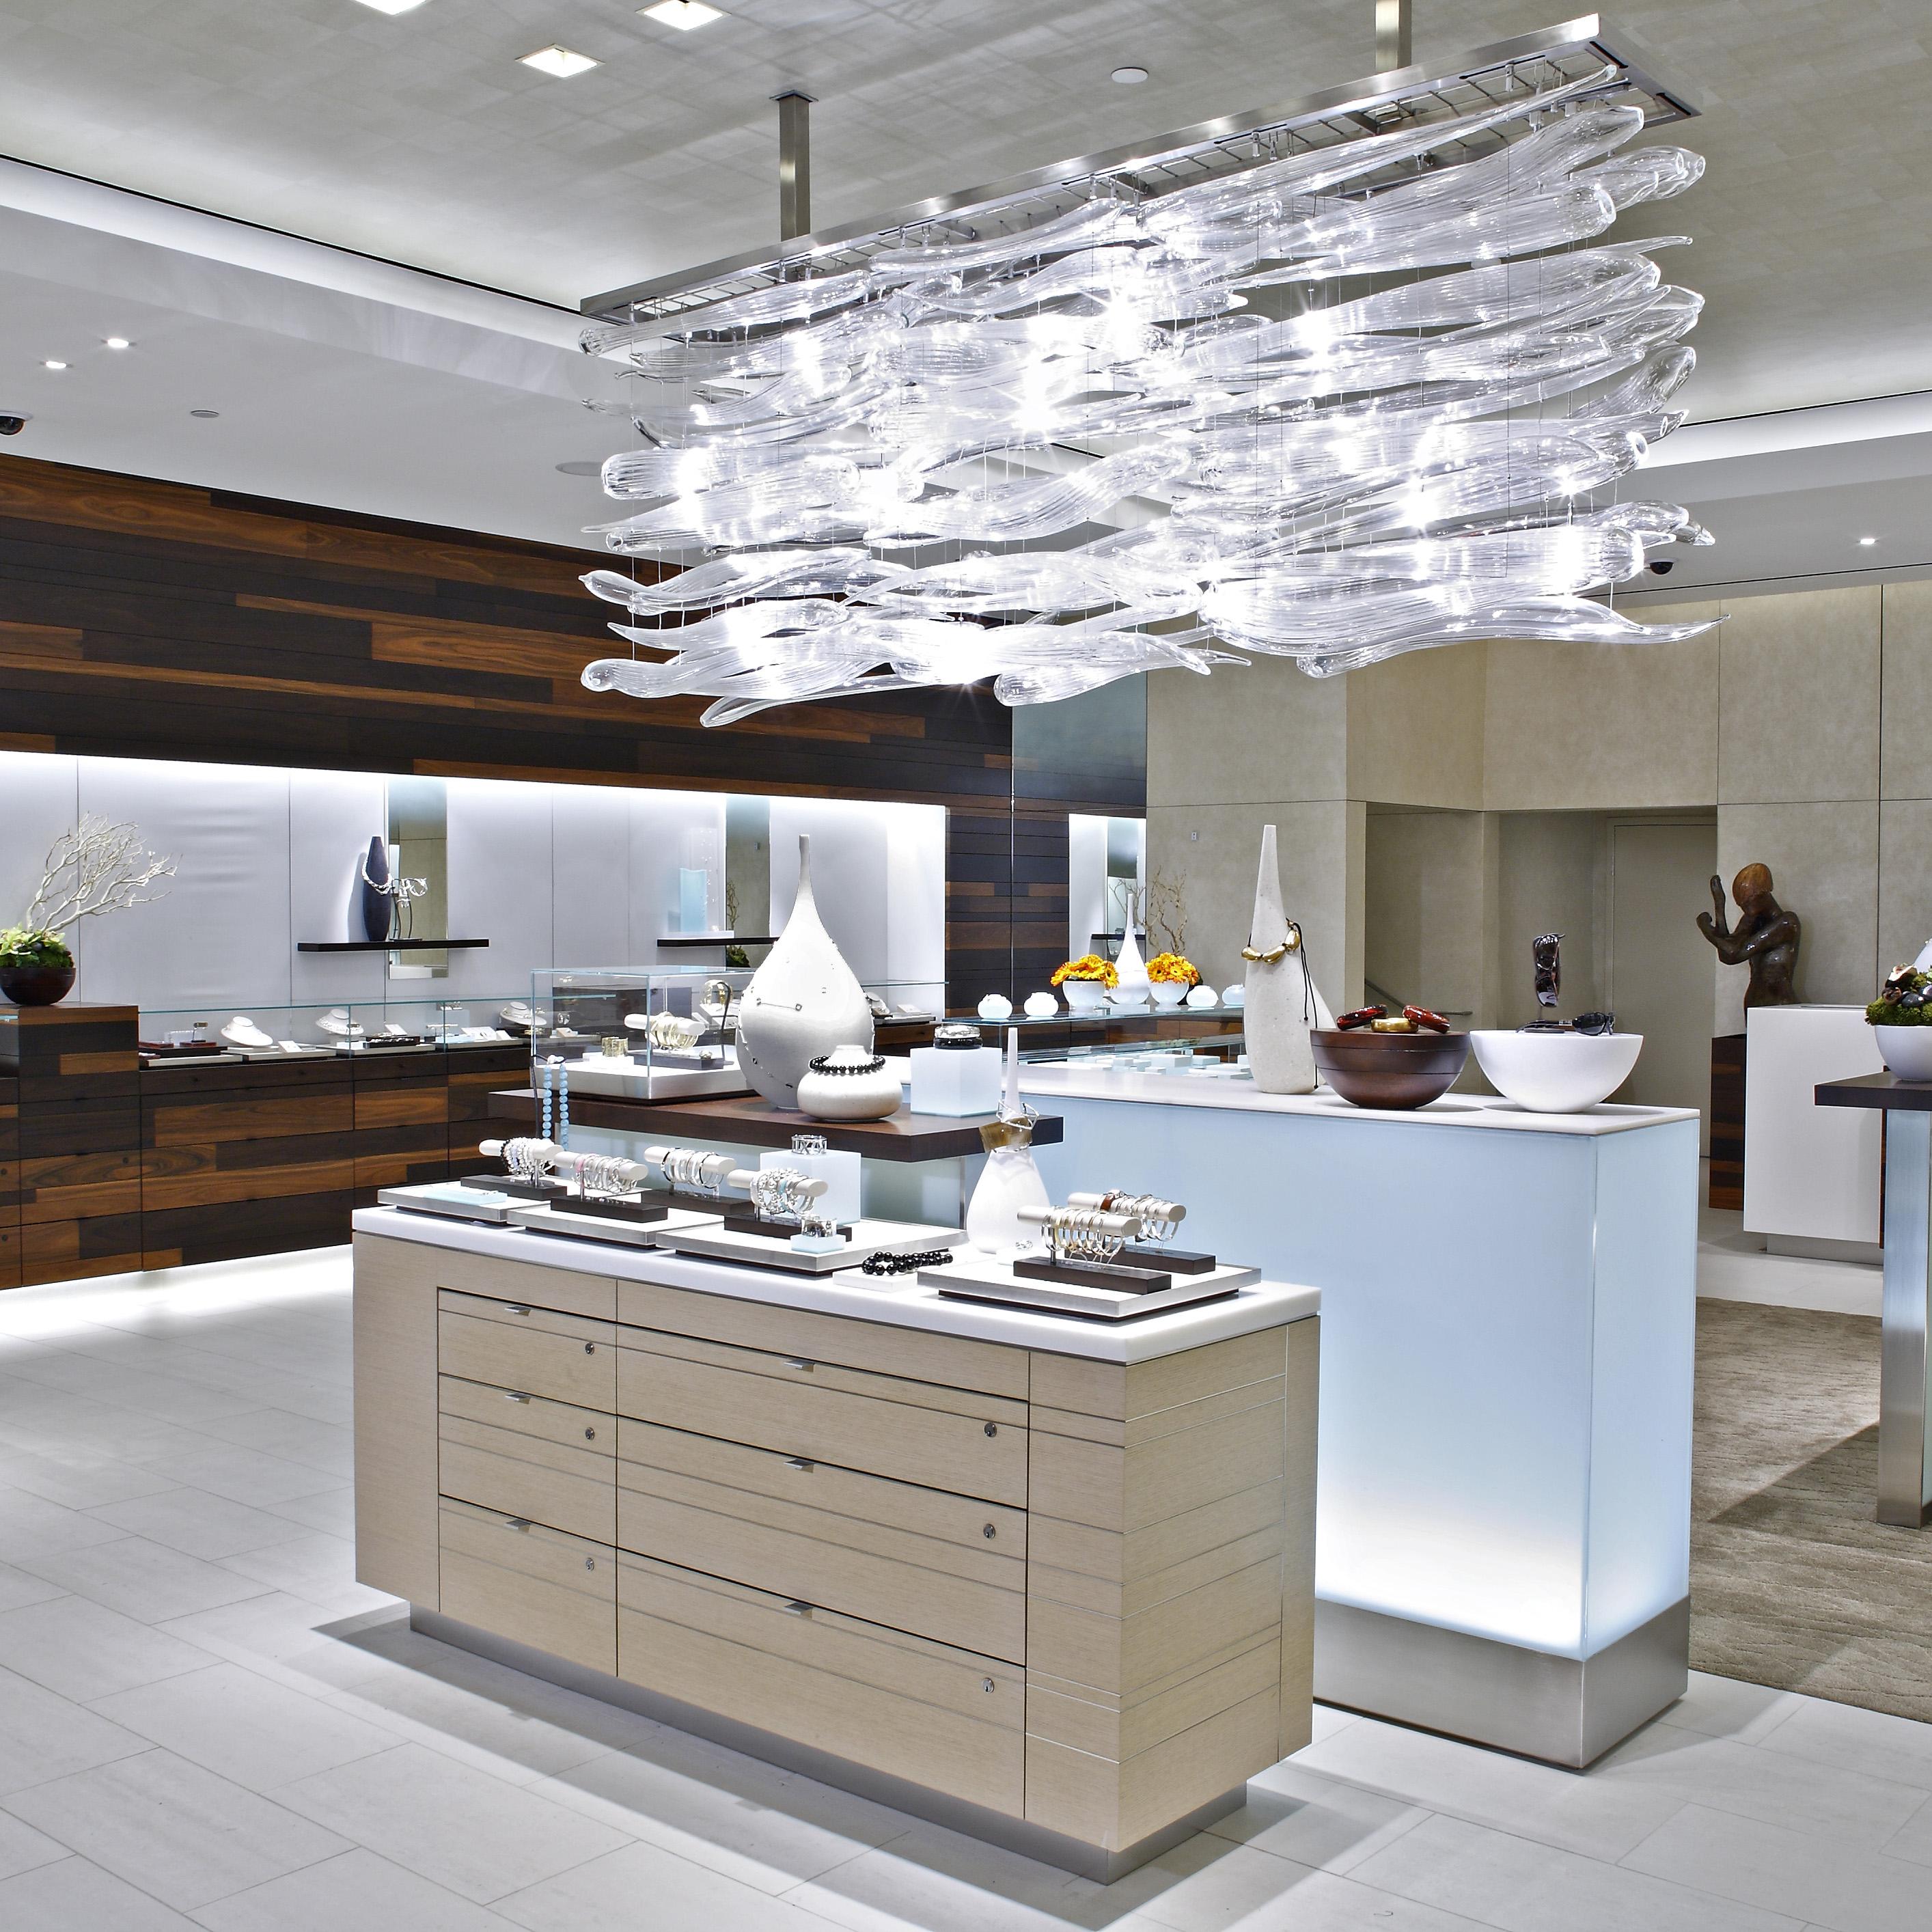 Tiffany & Co., Glendale, CA